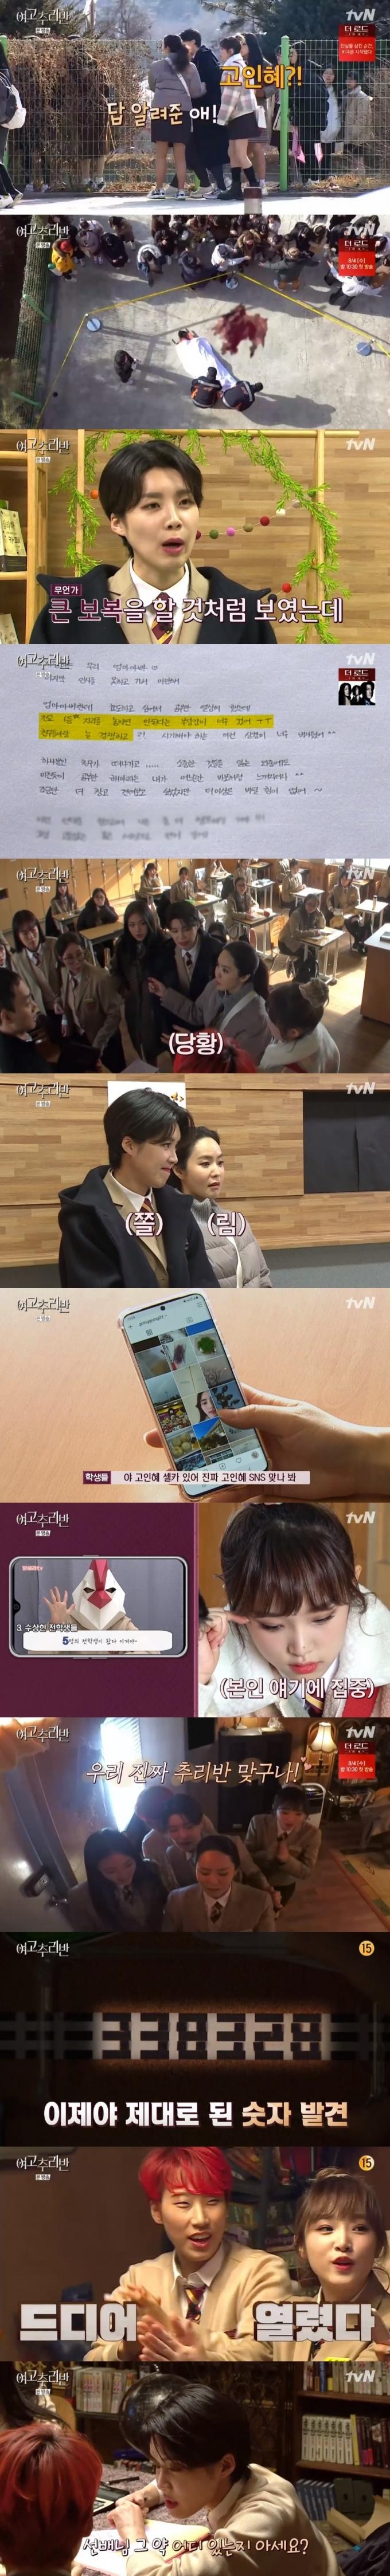 tvN '여고추리반' 캡처 © 뉴스1